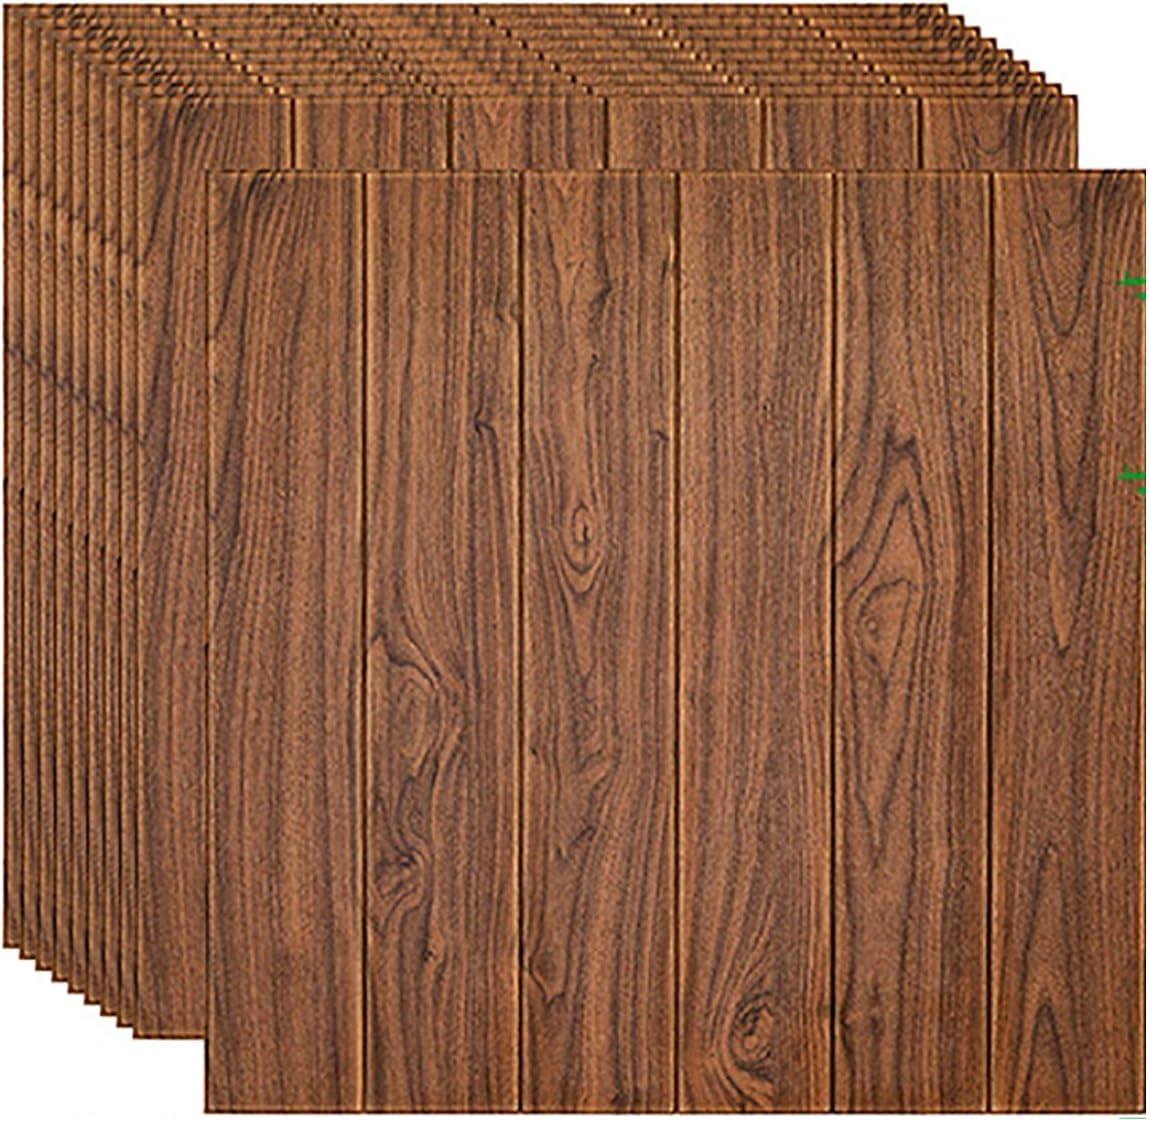 Dallas Mall LXZFJW 3D Ranking TOP7 Wallpaper Self-Adhesive Foam Interior Wall for Panels